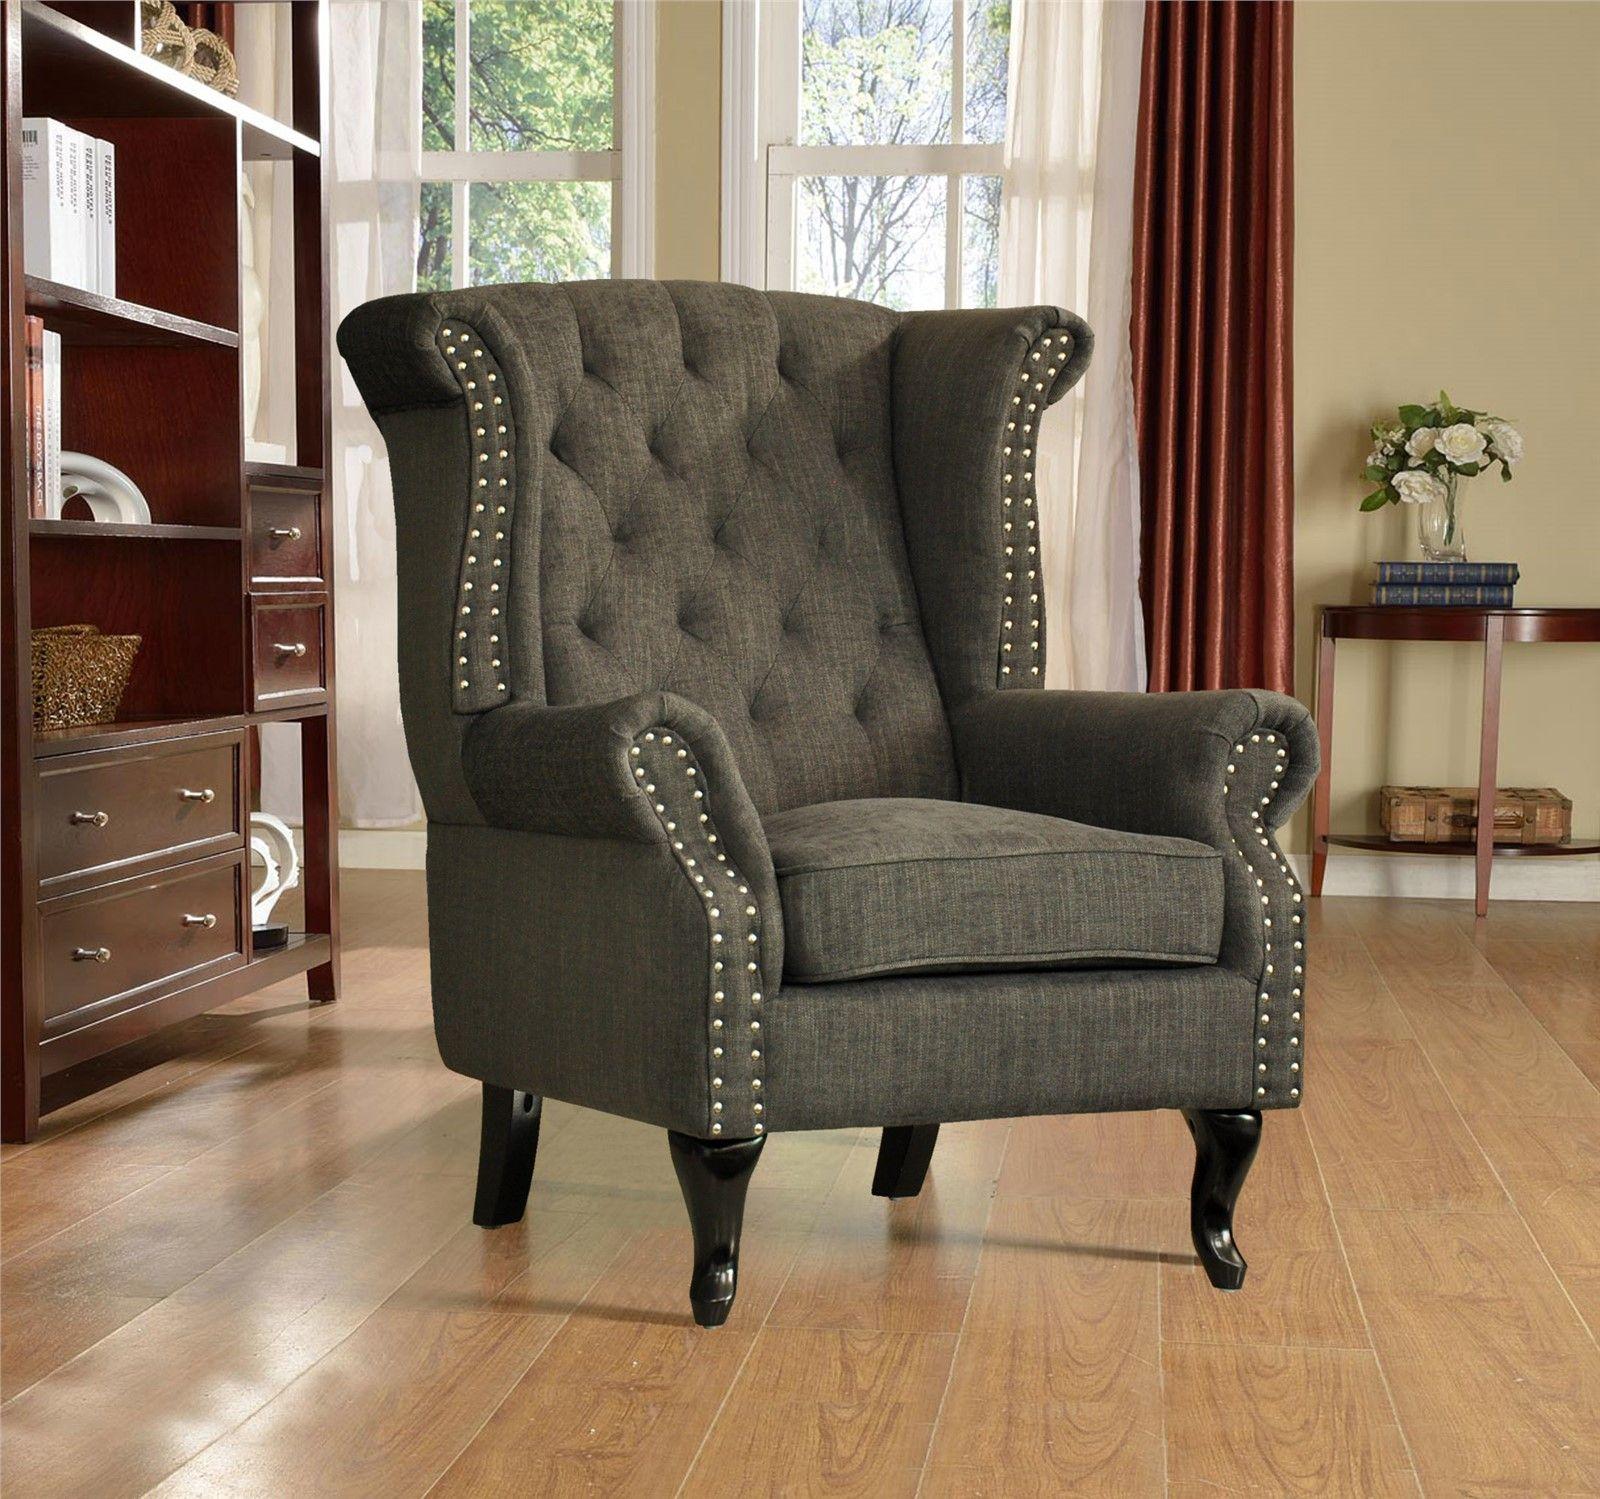 New Roxy Luxury Fabric Fireside Wing Back Chair / Armchair